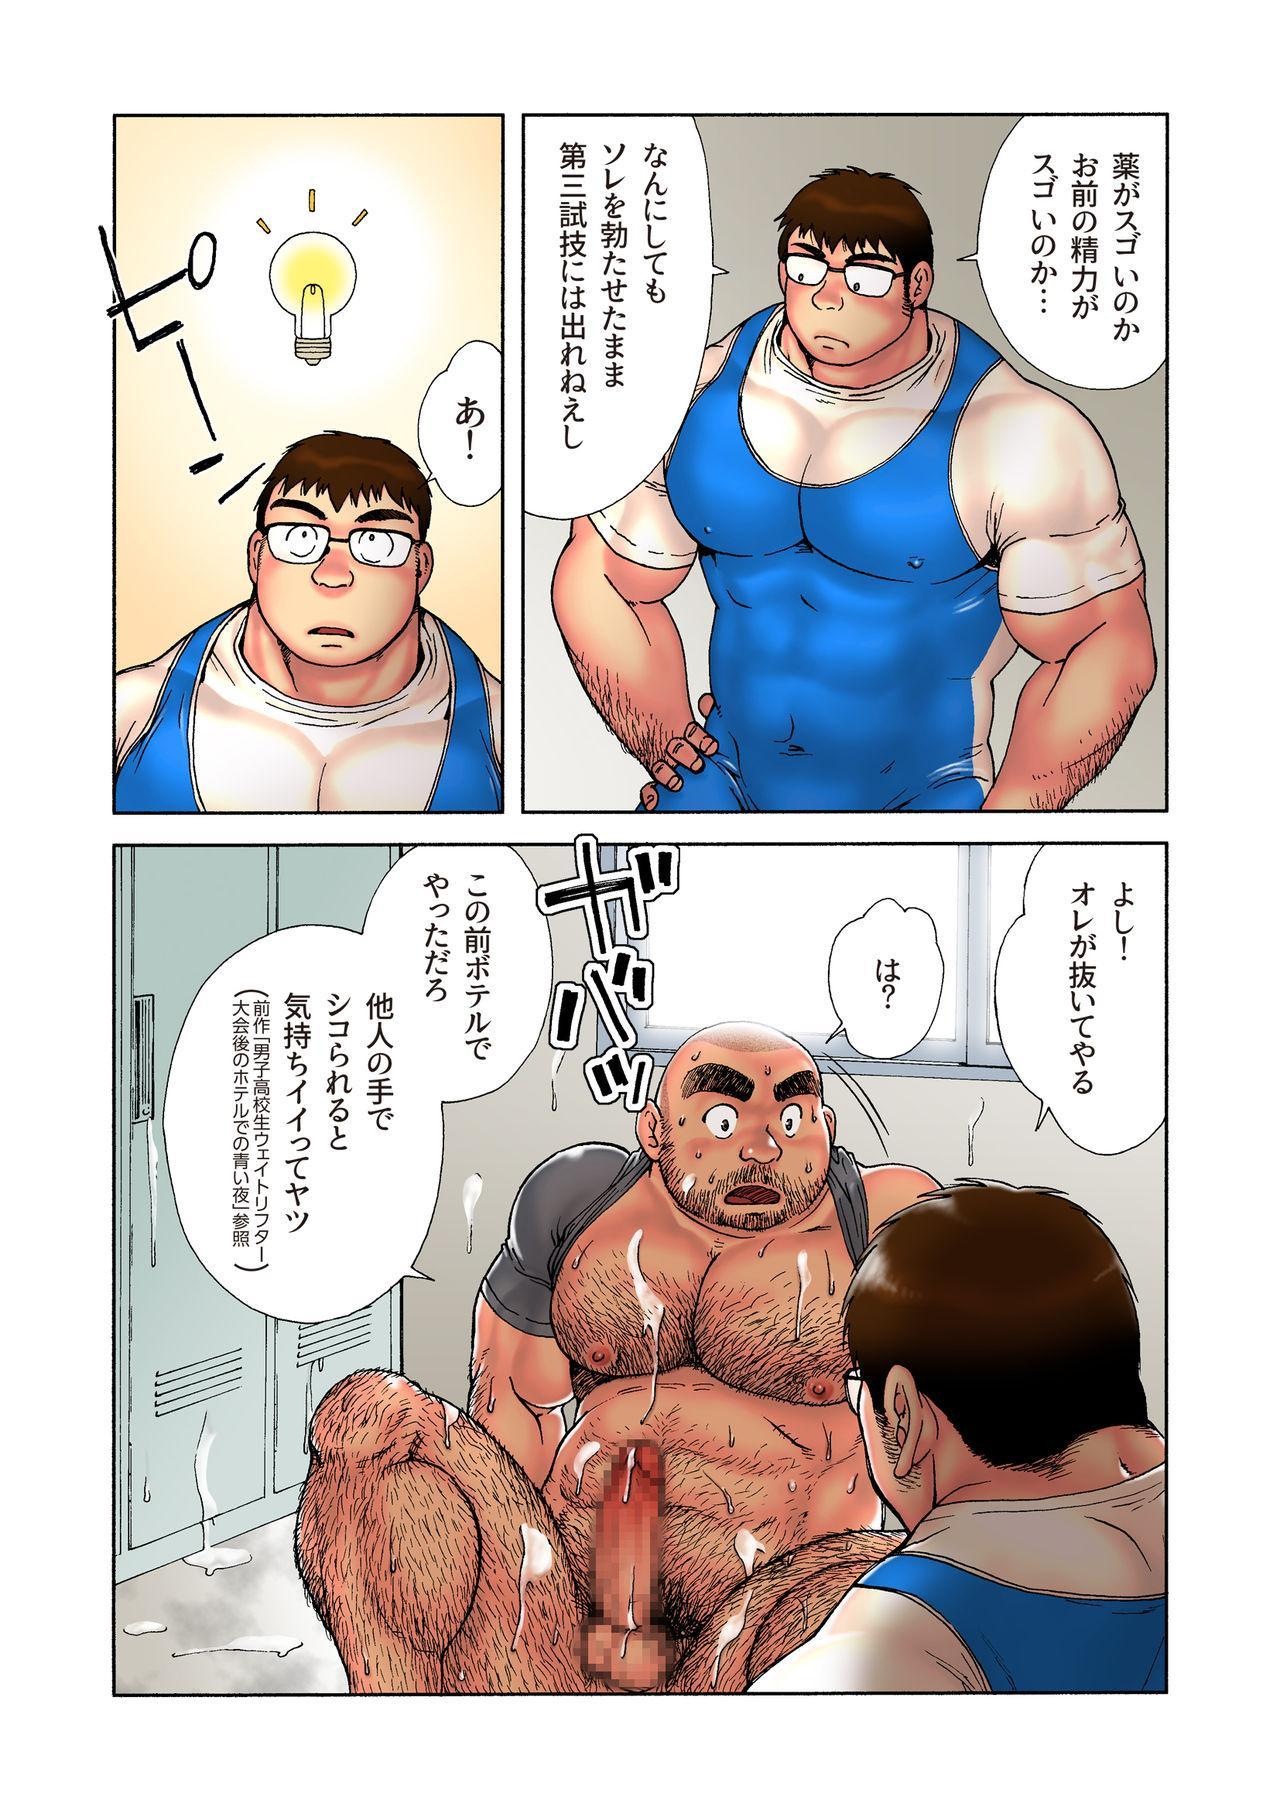 Danshi Koukousei Weightlifter Shiai-chuu, Osae kirenai Wakai Takeri 39